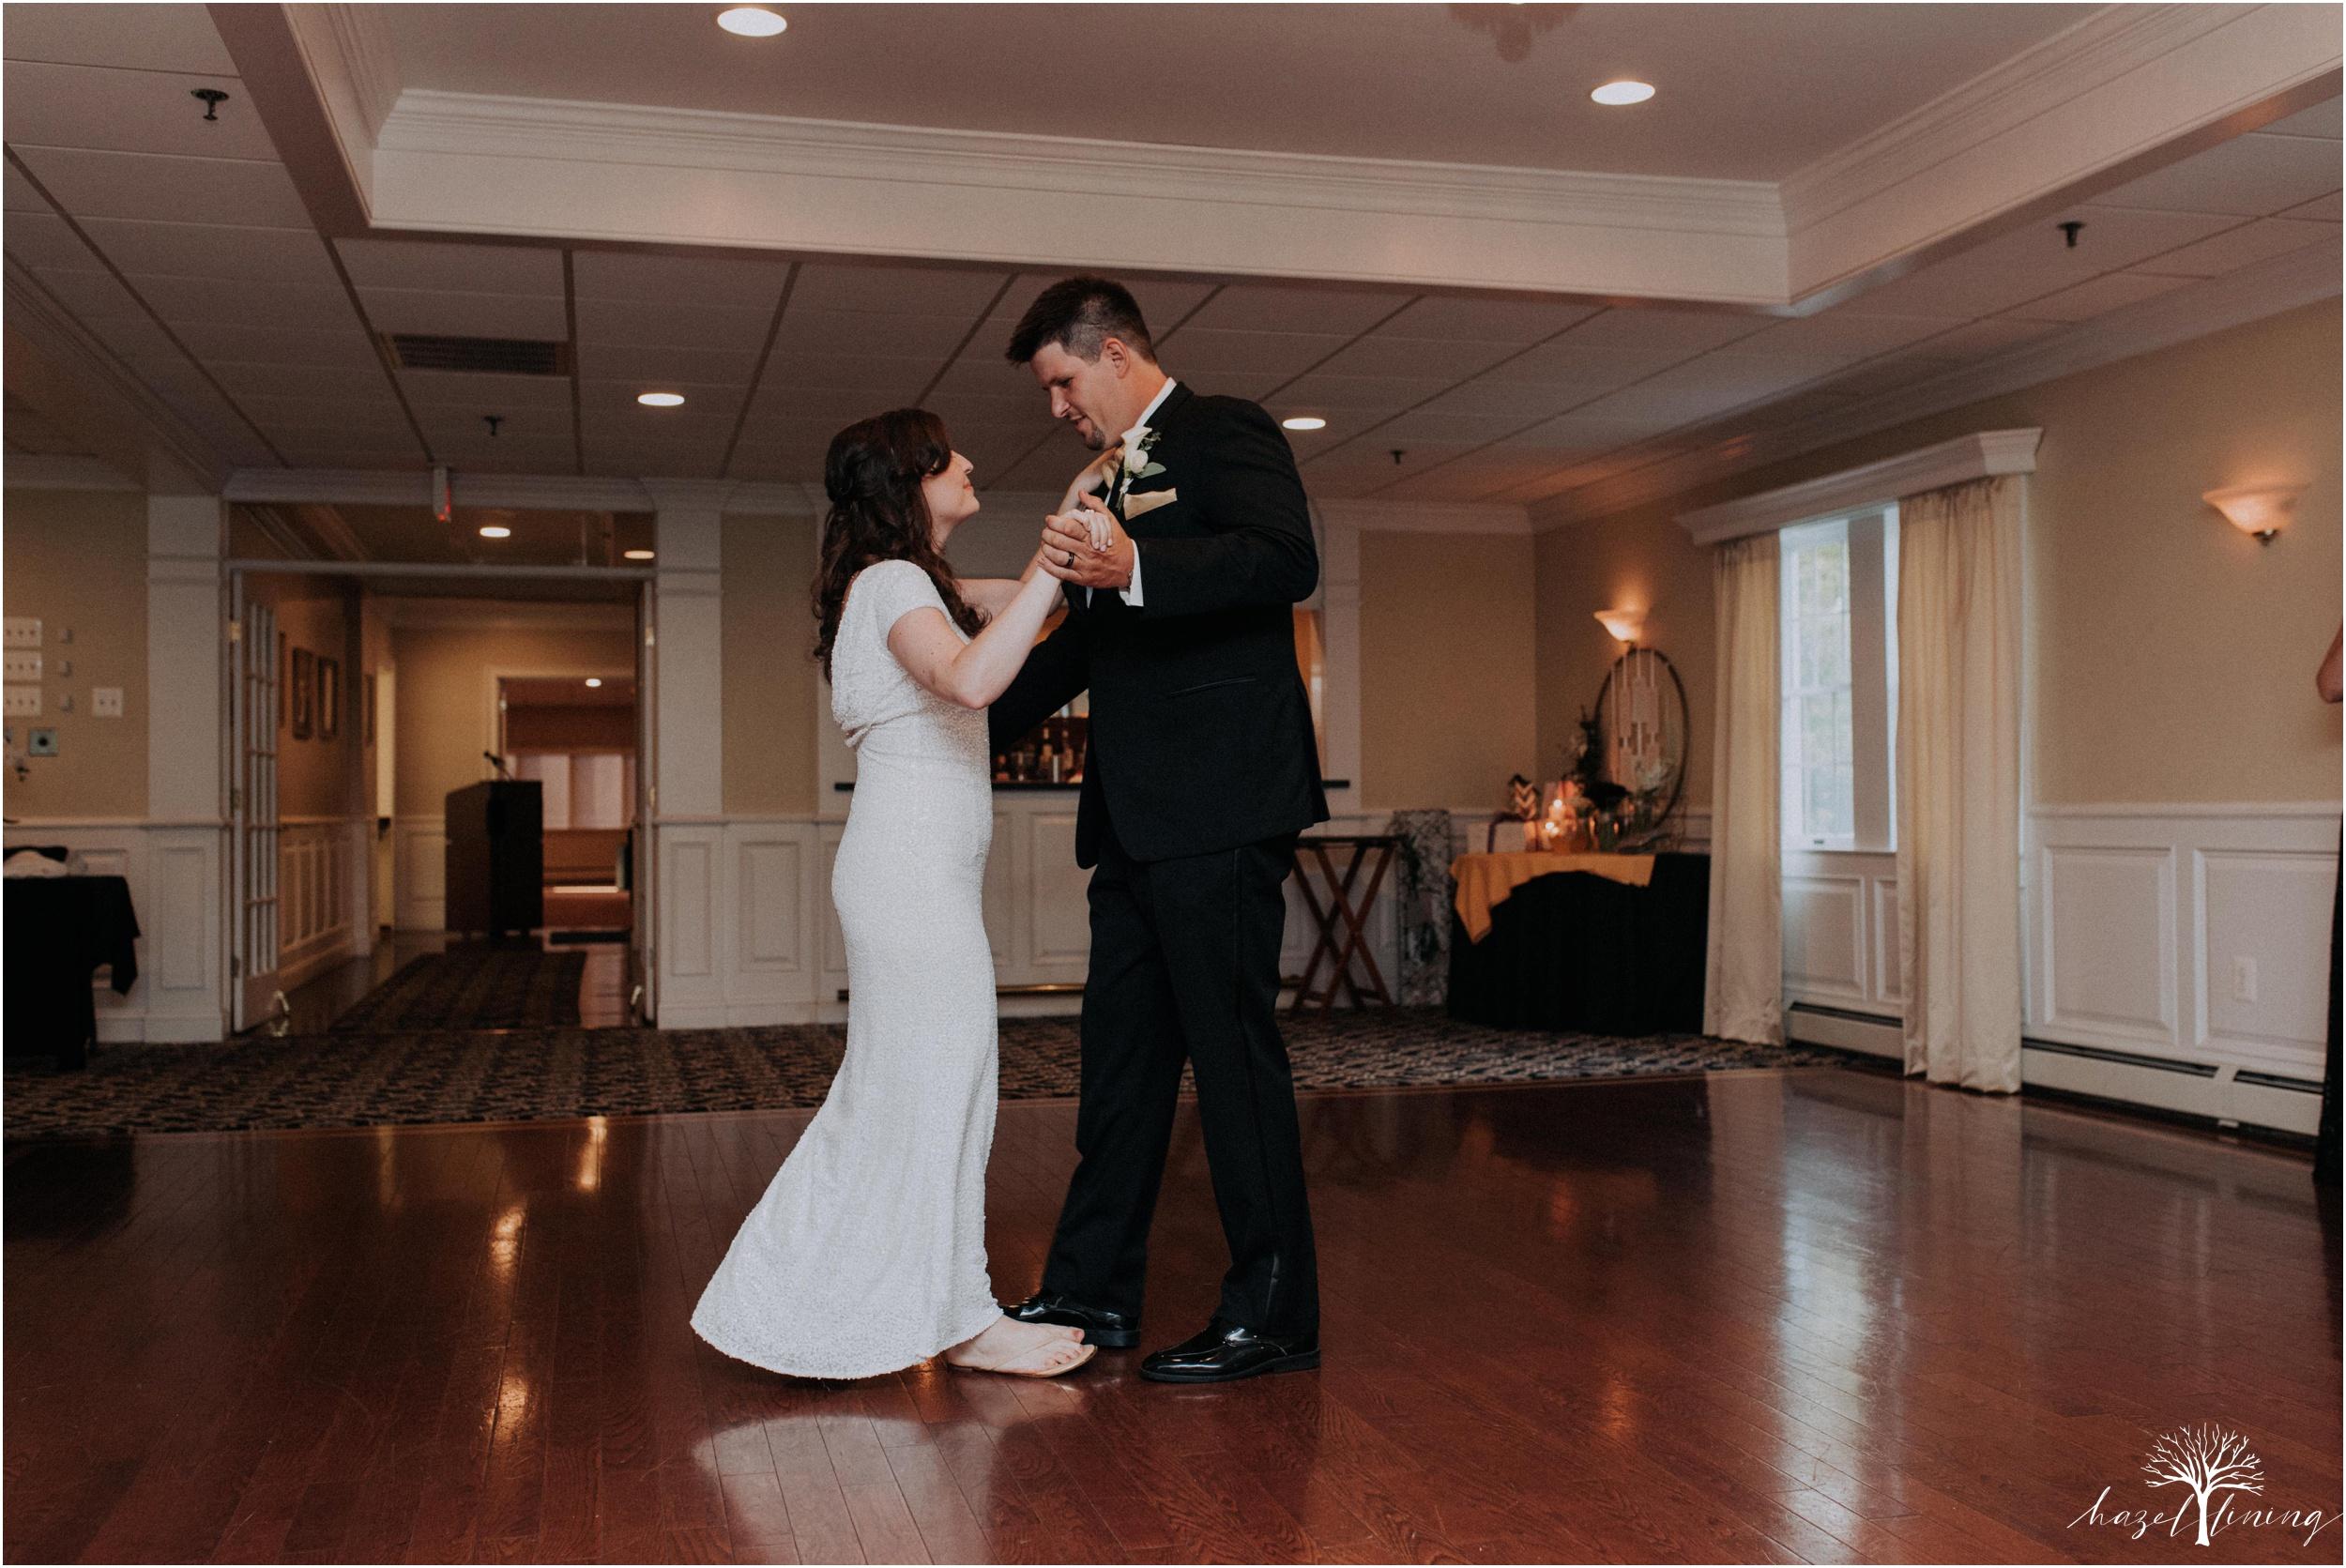 elizabeth-doelp-andrew-foreback-middletown-country-club-summer-langhorne-pennsylvania-wedding-hazel-lining-travel-wedding-elopement-photography_0130.jpg